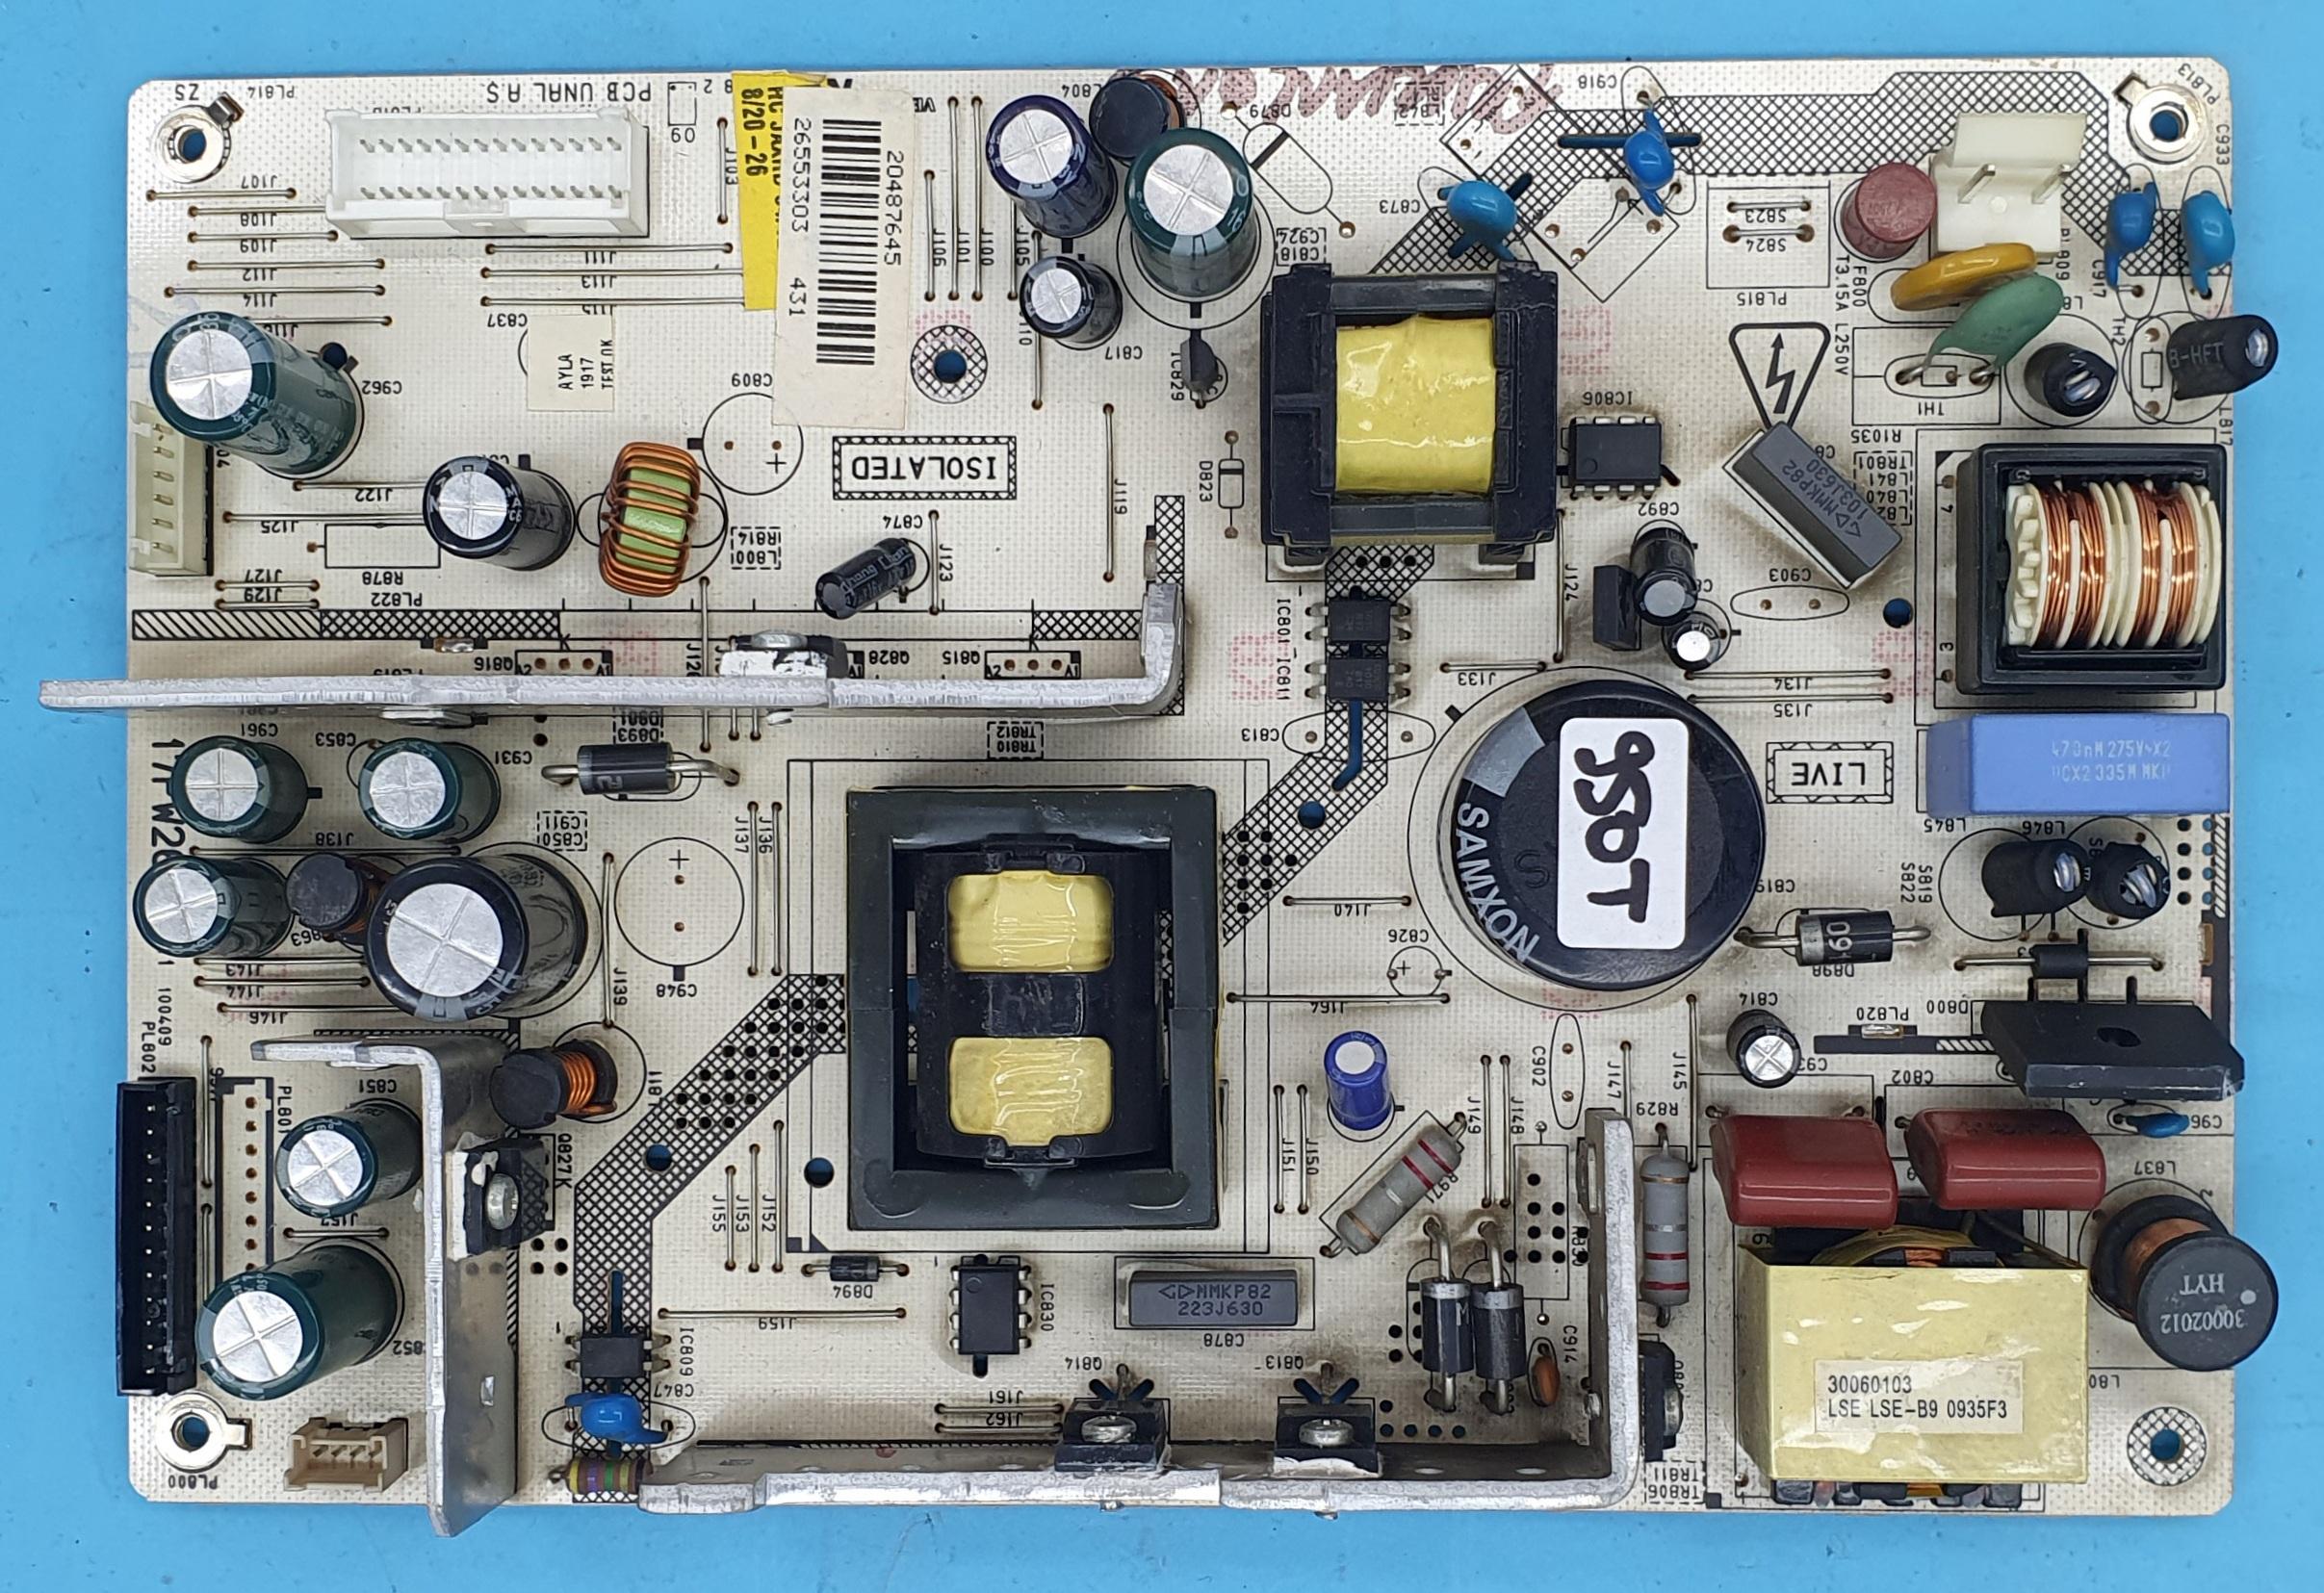 17PW26-4,20487645 VESTEL Power (KDV DAHİL = 118 TL)